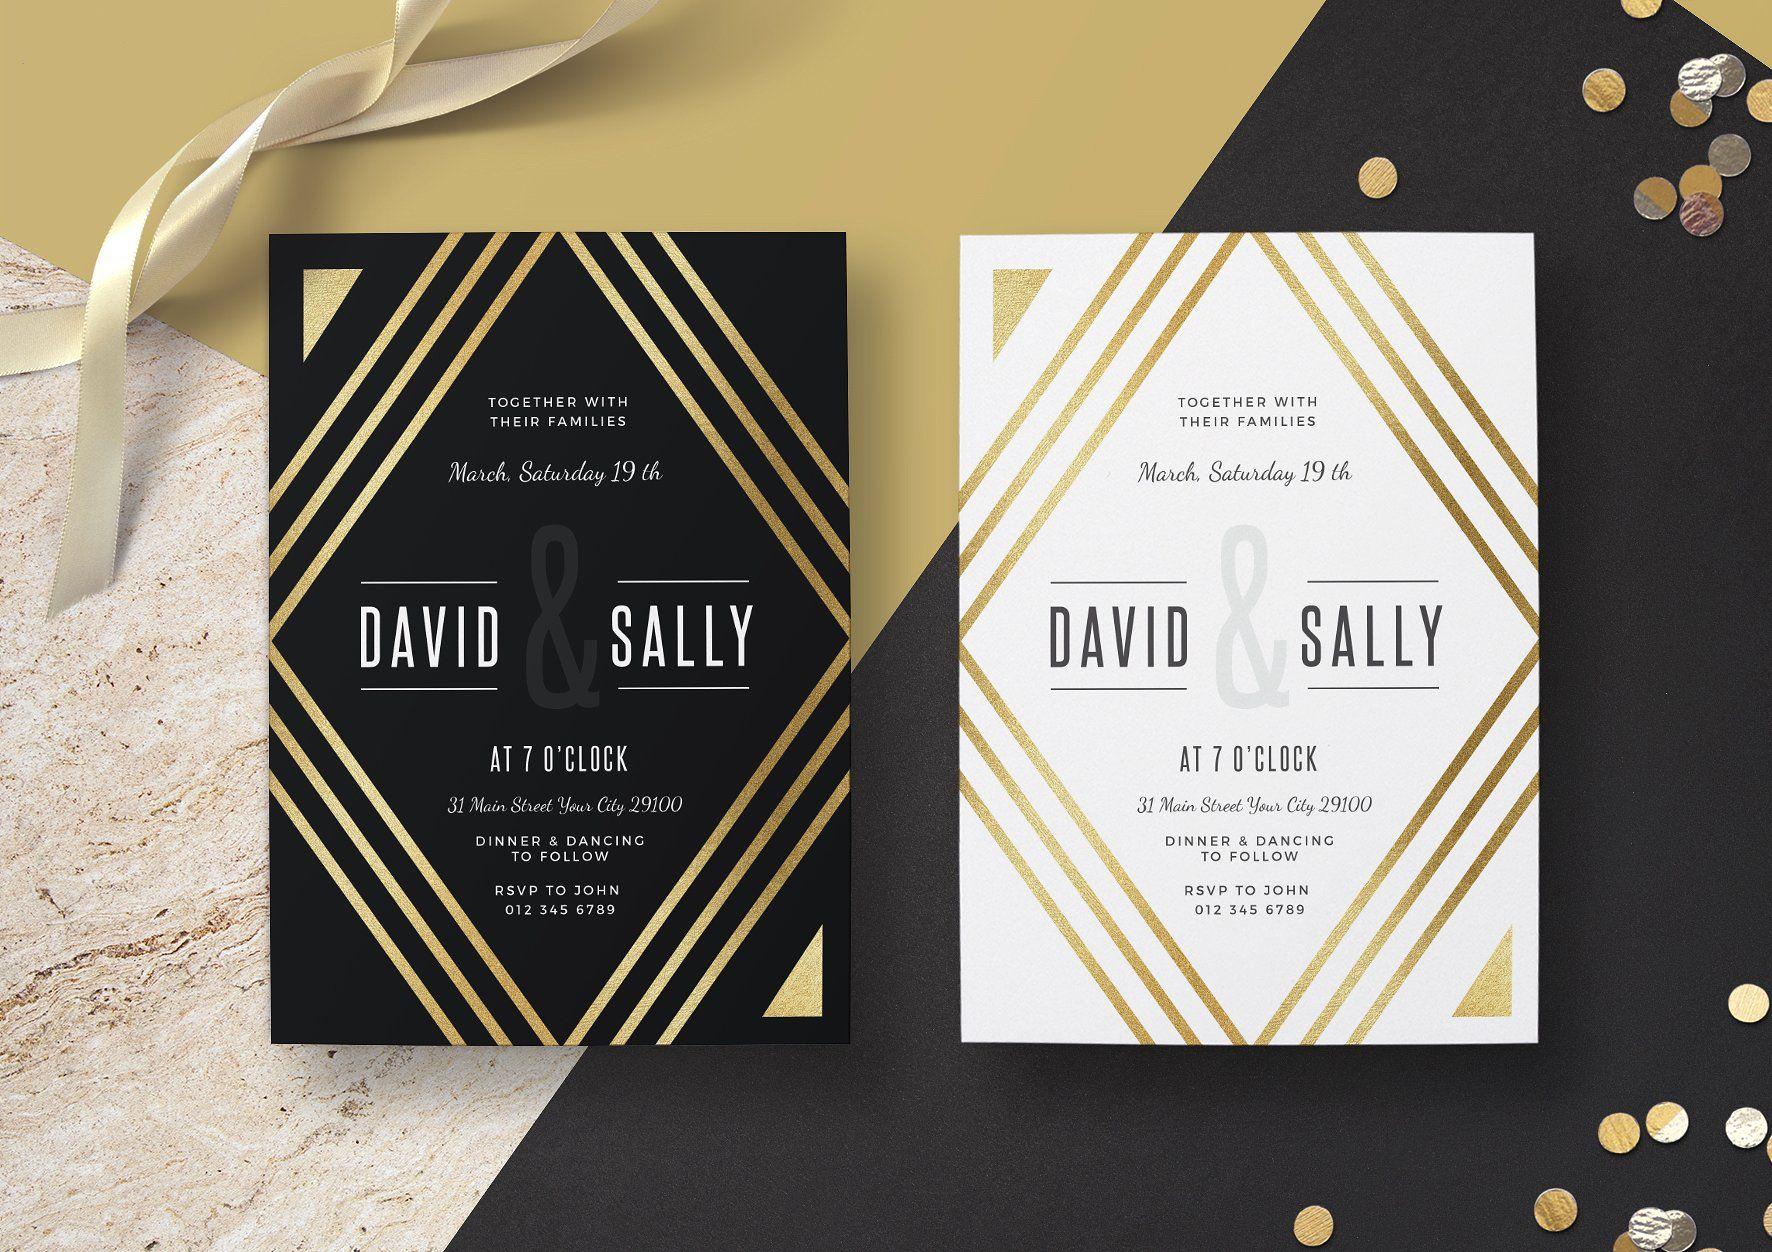 Gold Wedding Invitation | Gold wedding invitations, Black and white wedding  invitations, Black wedding invitations